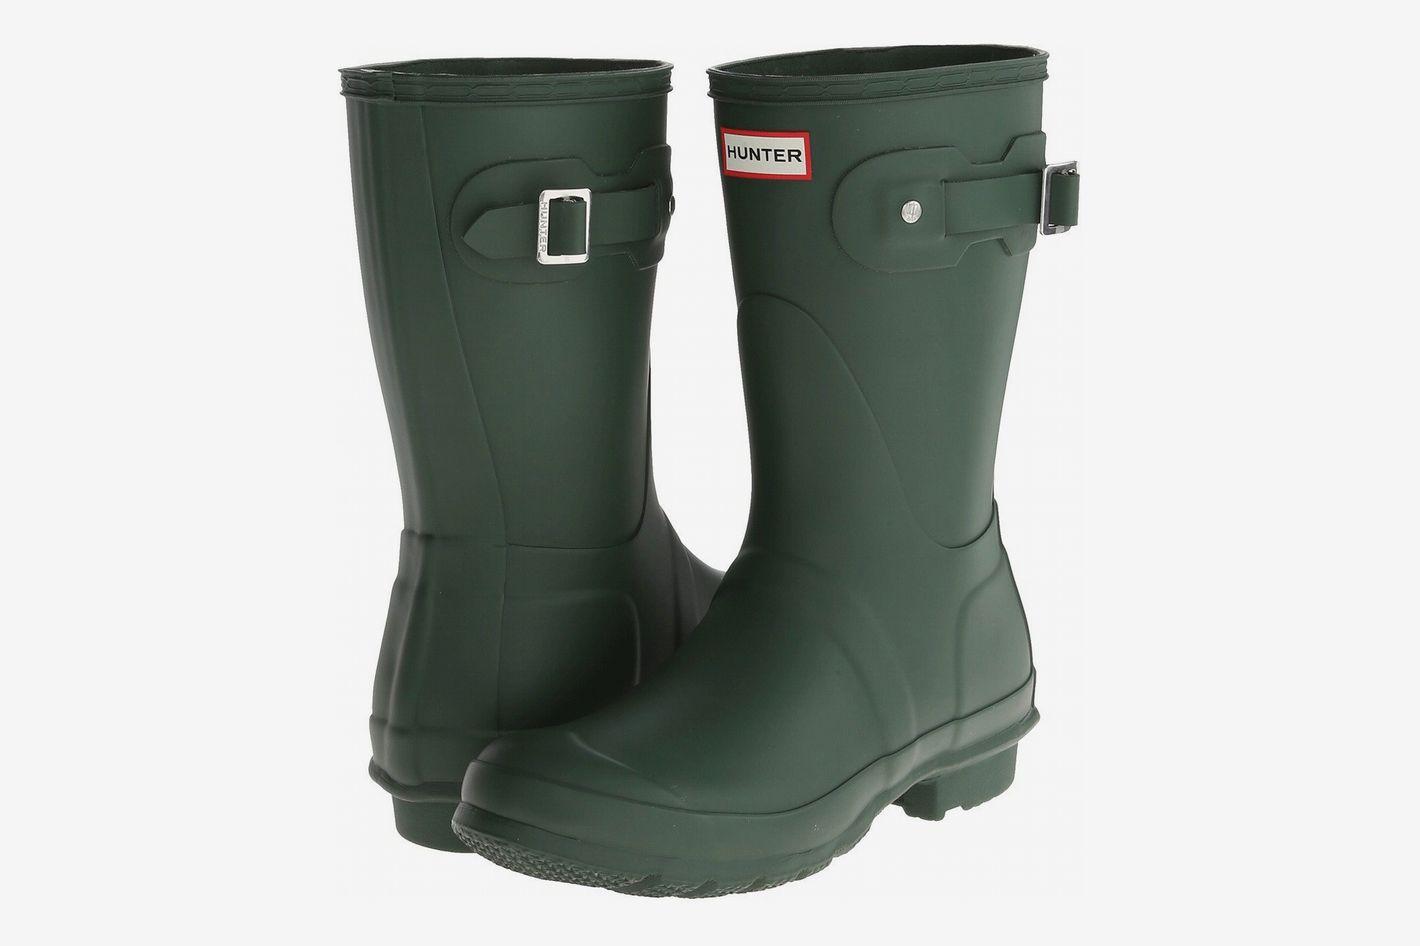 3eff620979d 13 Best Stylish Rain Boots for Women